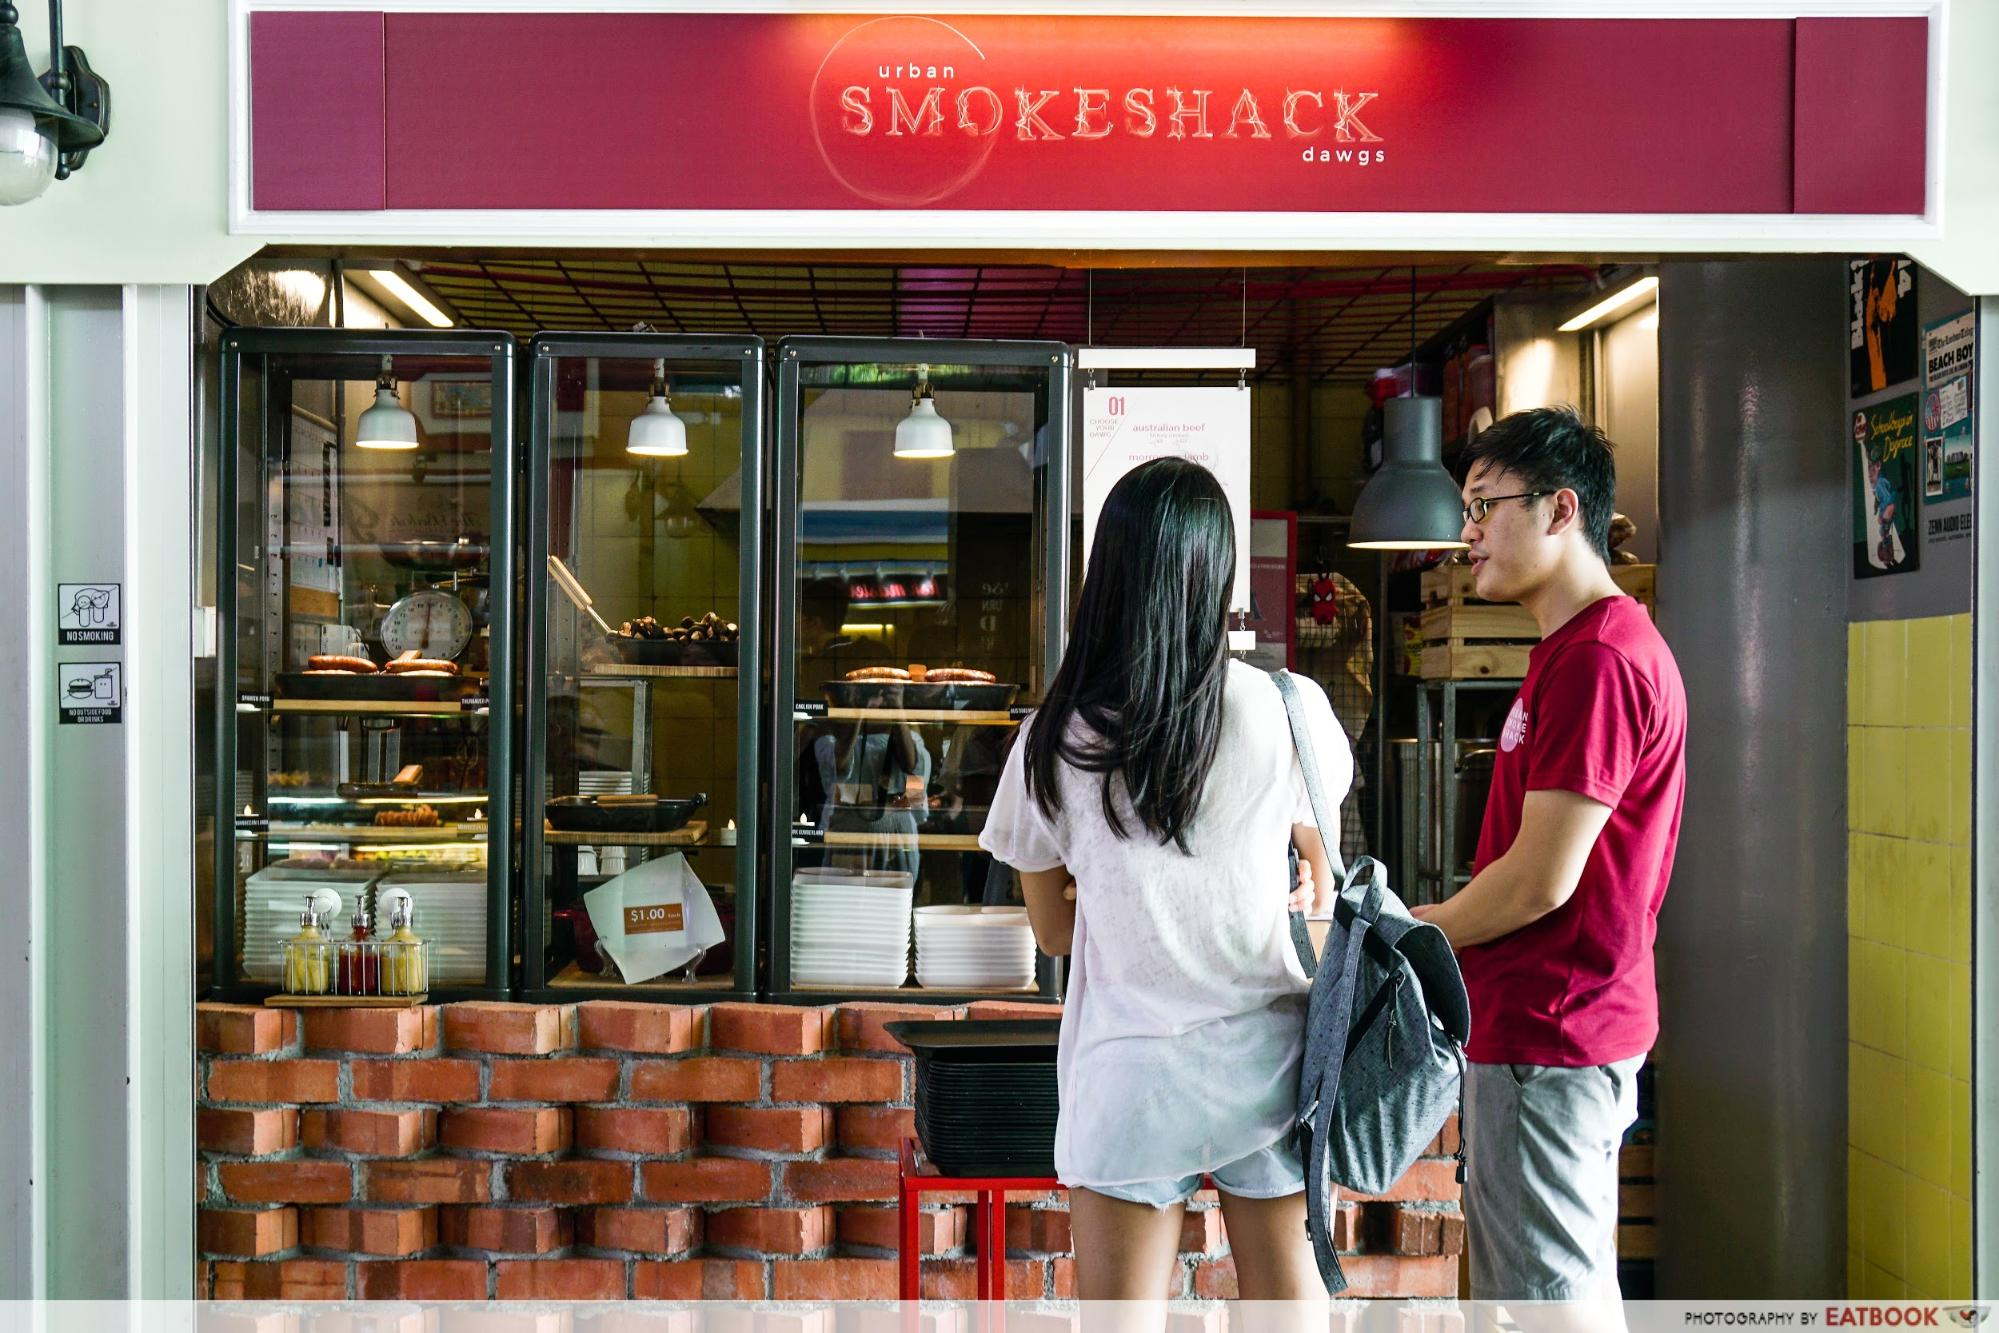 Urban Smokeshack - stall front